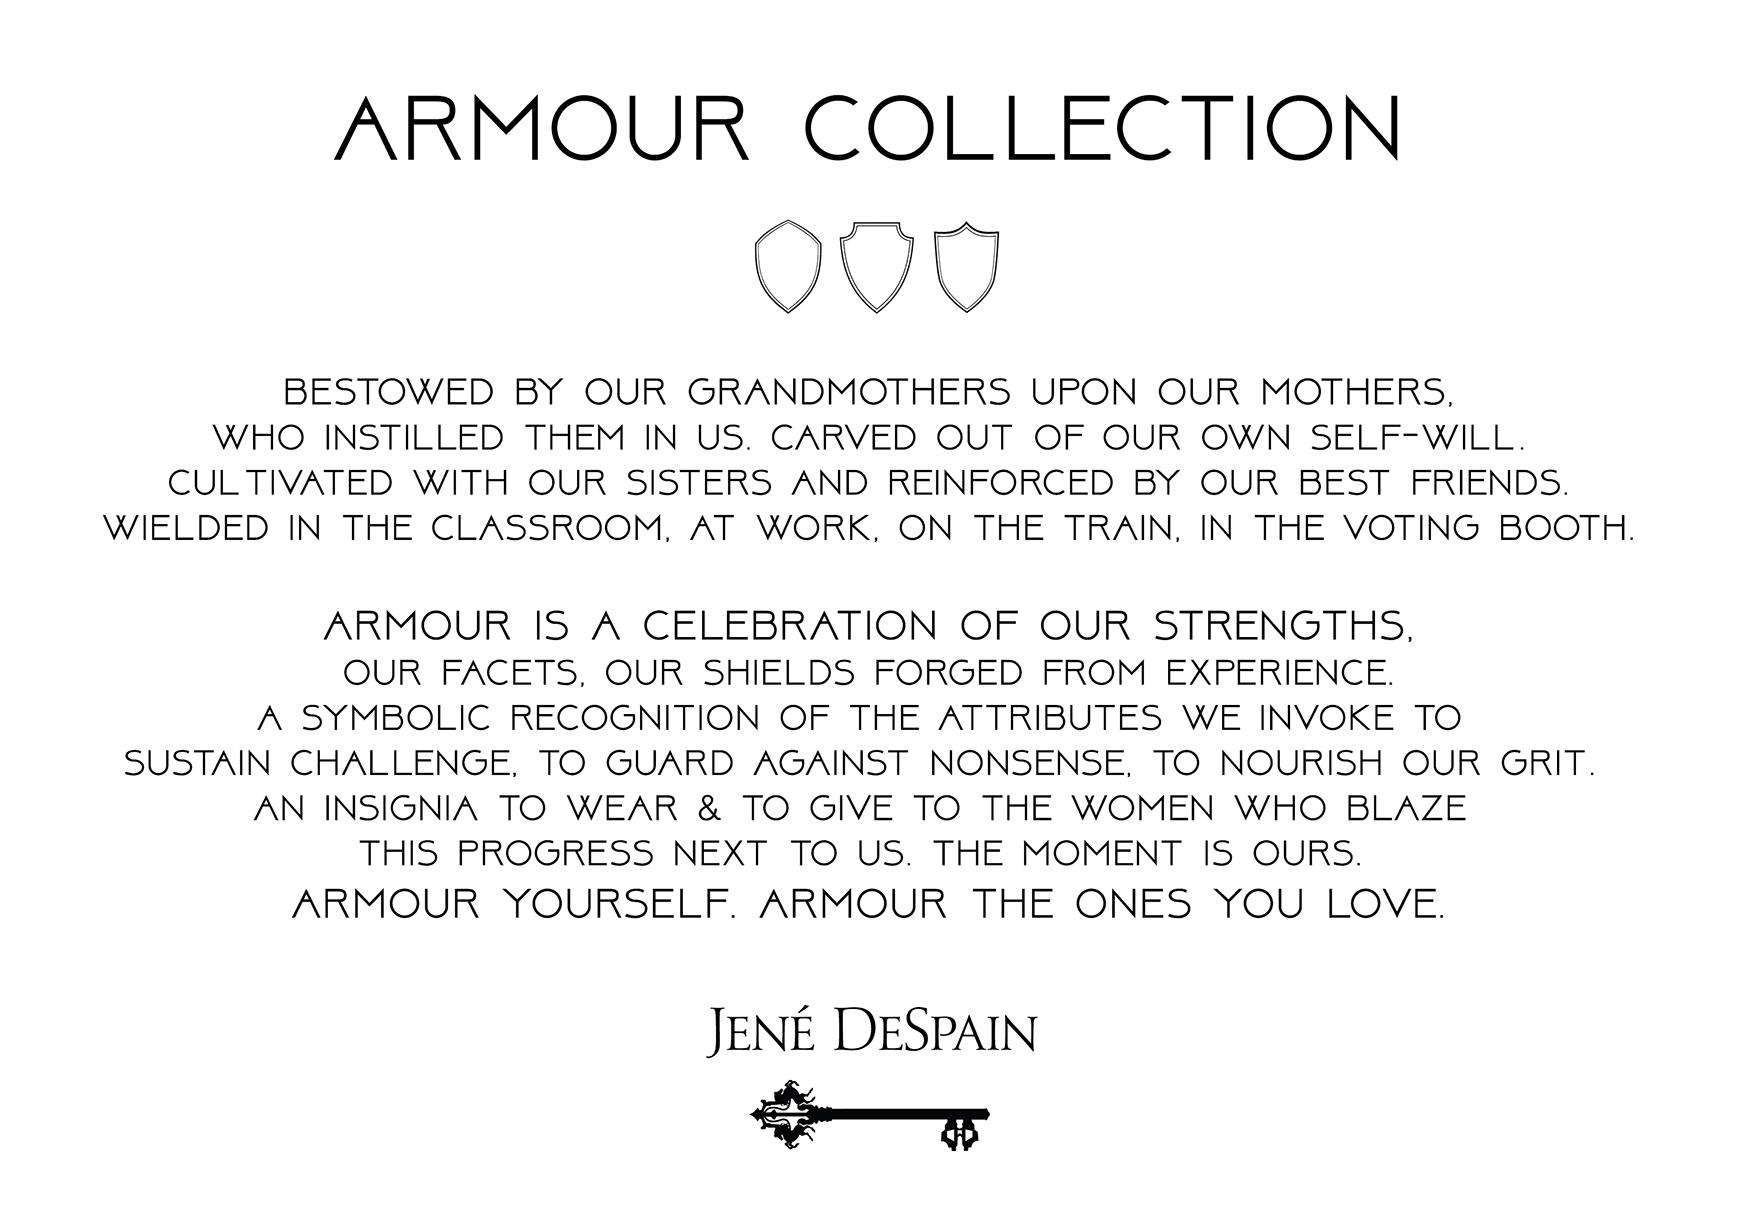 ArmourSheets1.jpg